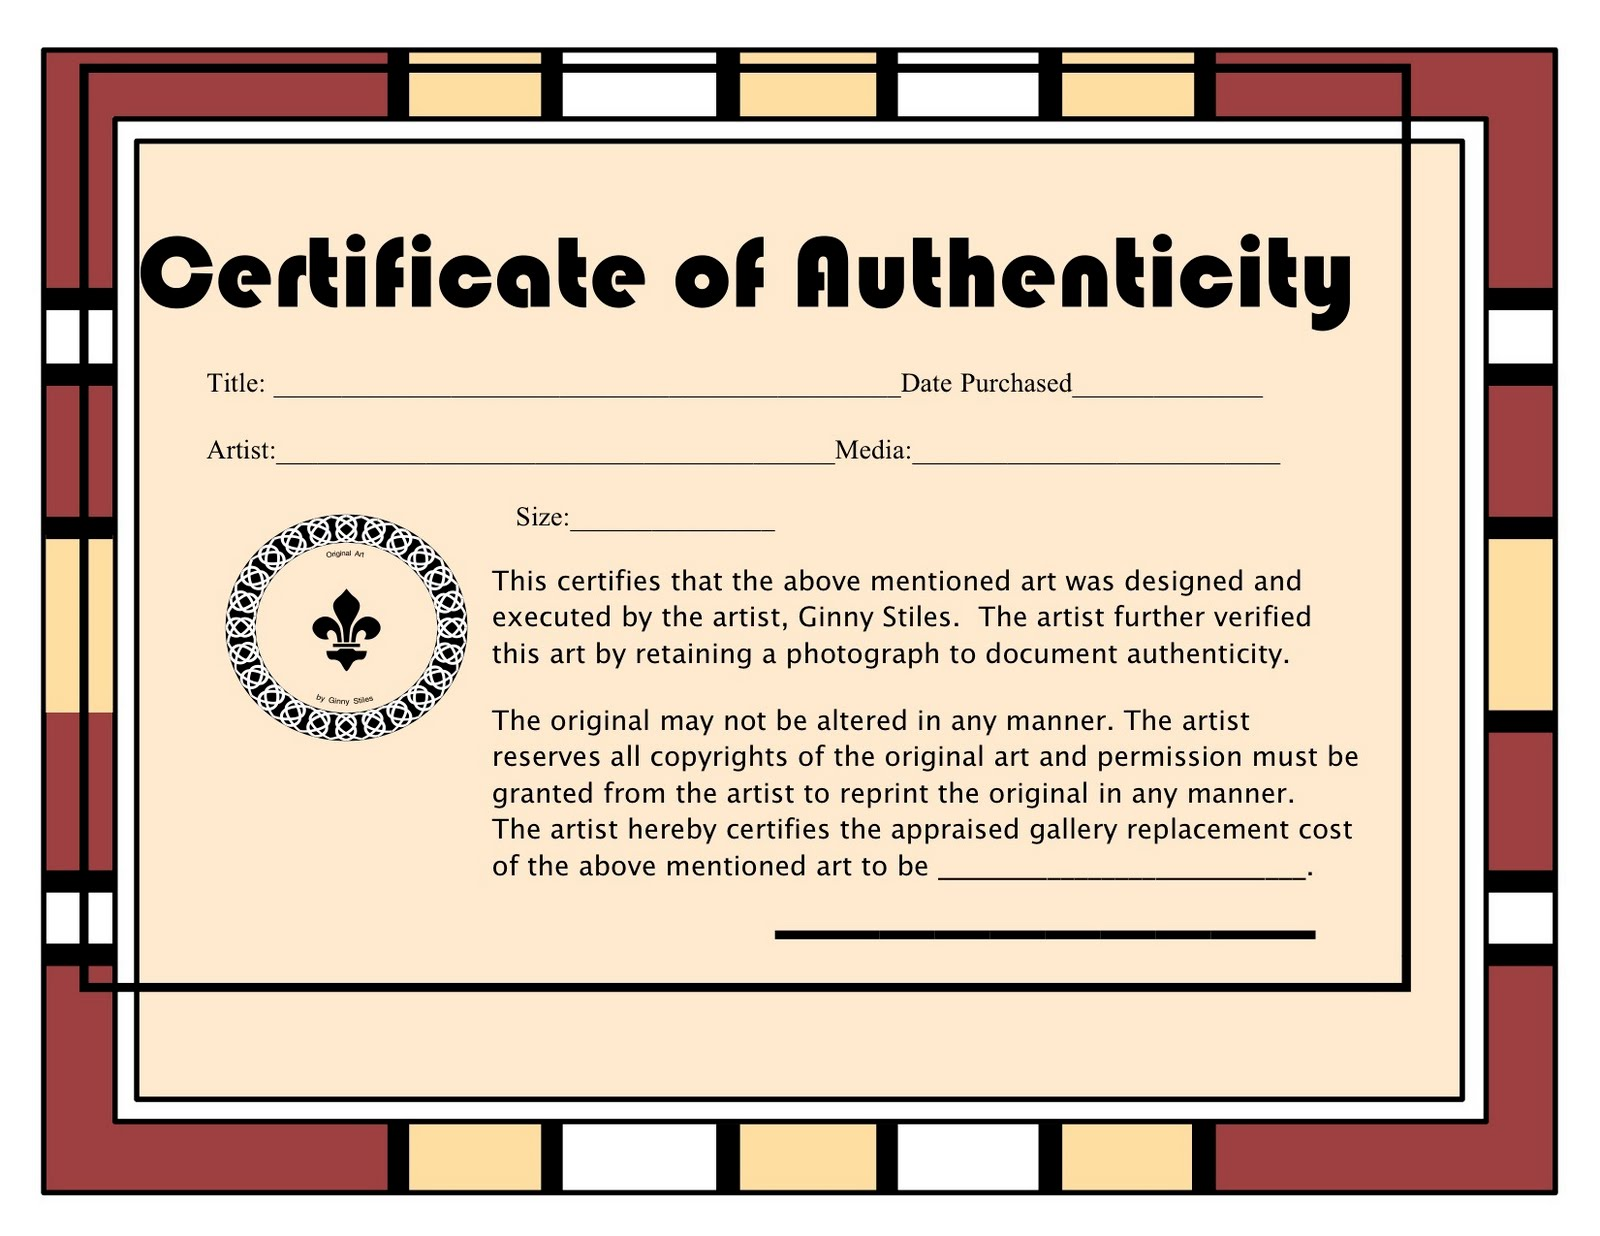 Certificate of authenticity template jeppefm certificate of authenticity template yelopaper Images